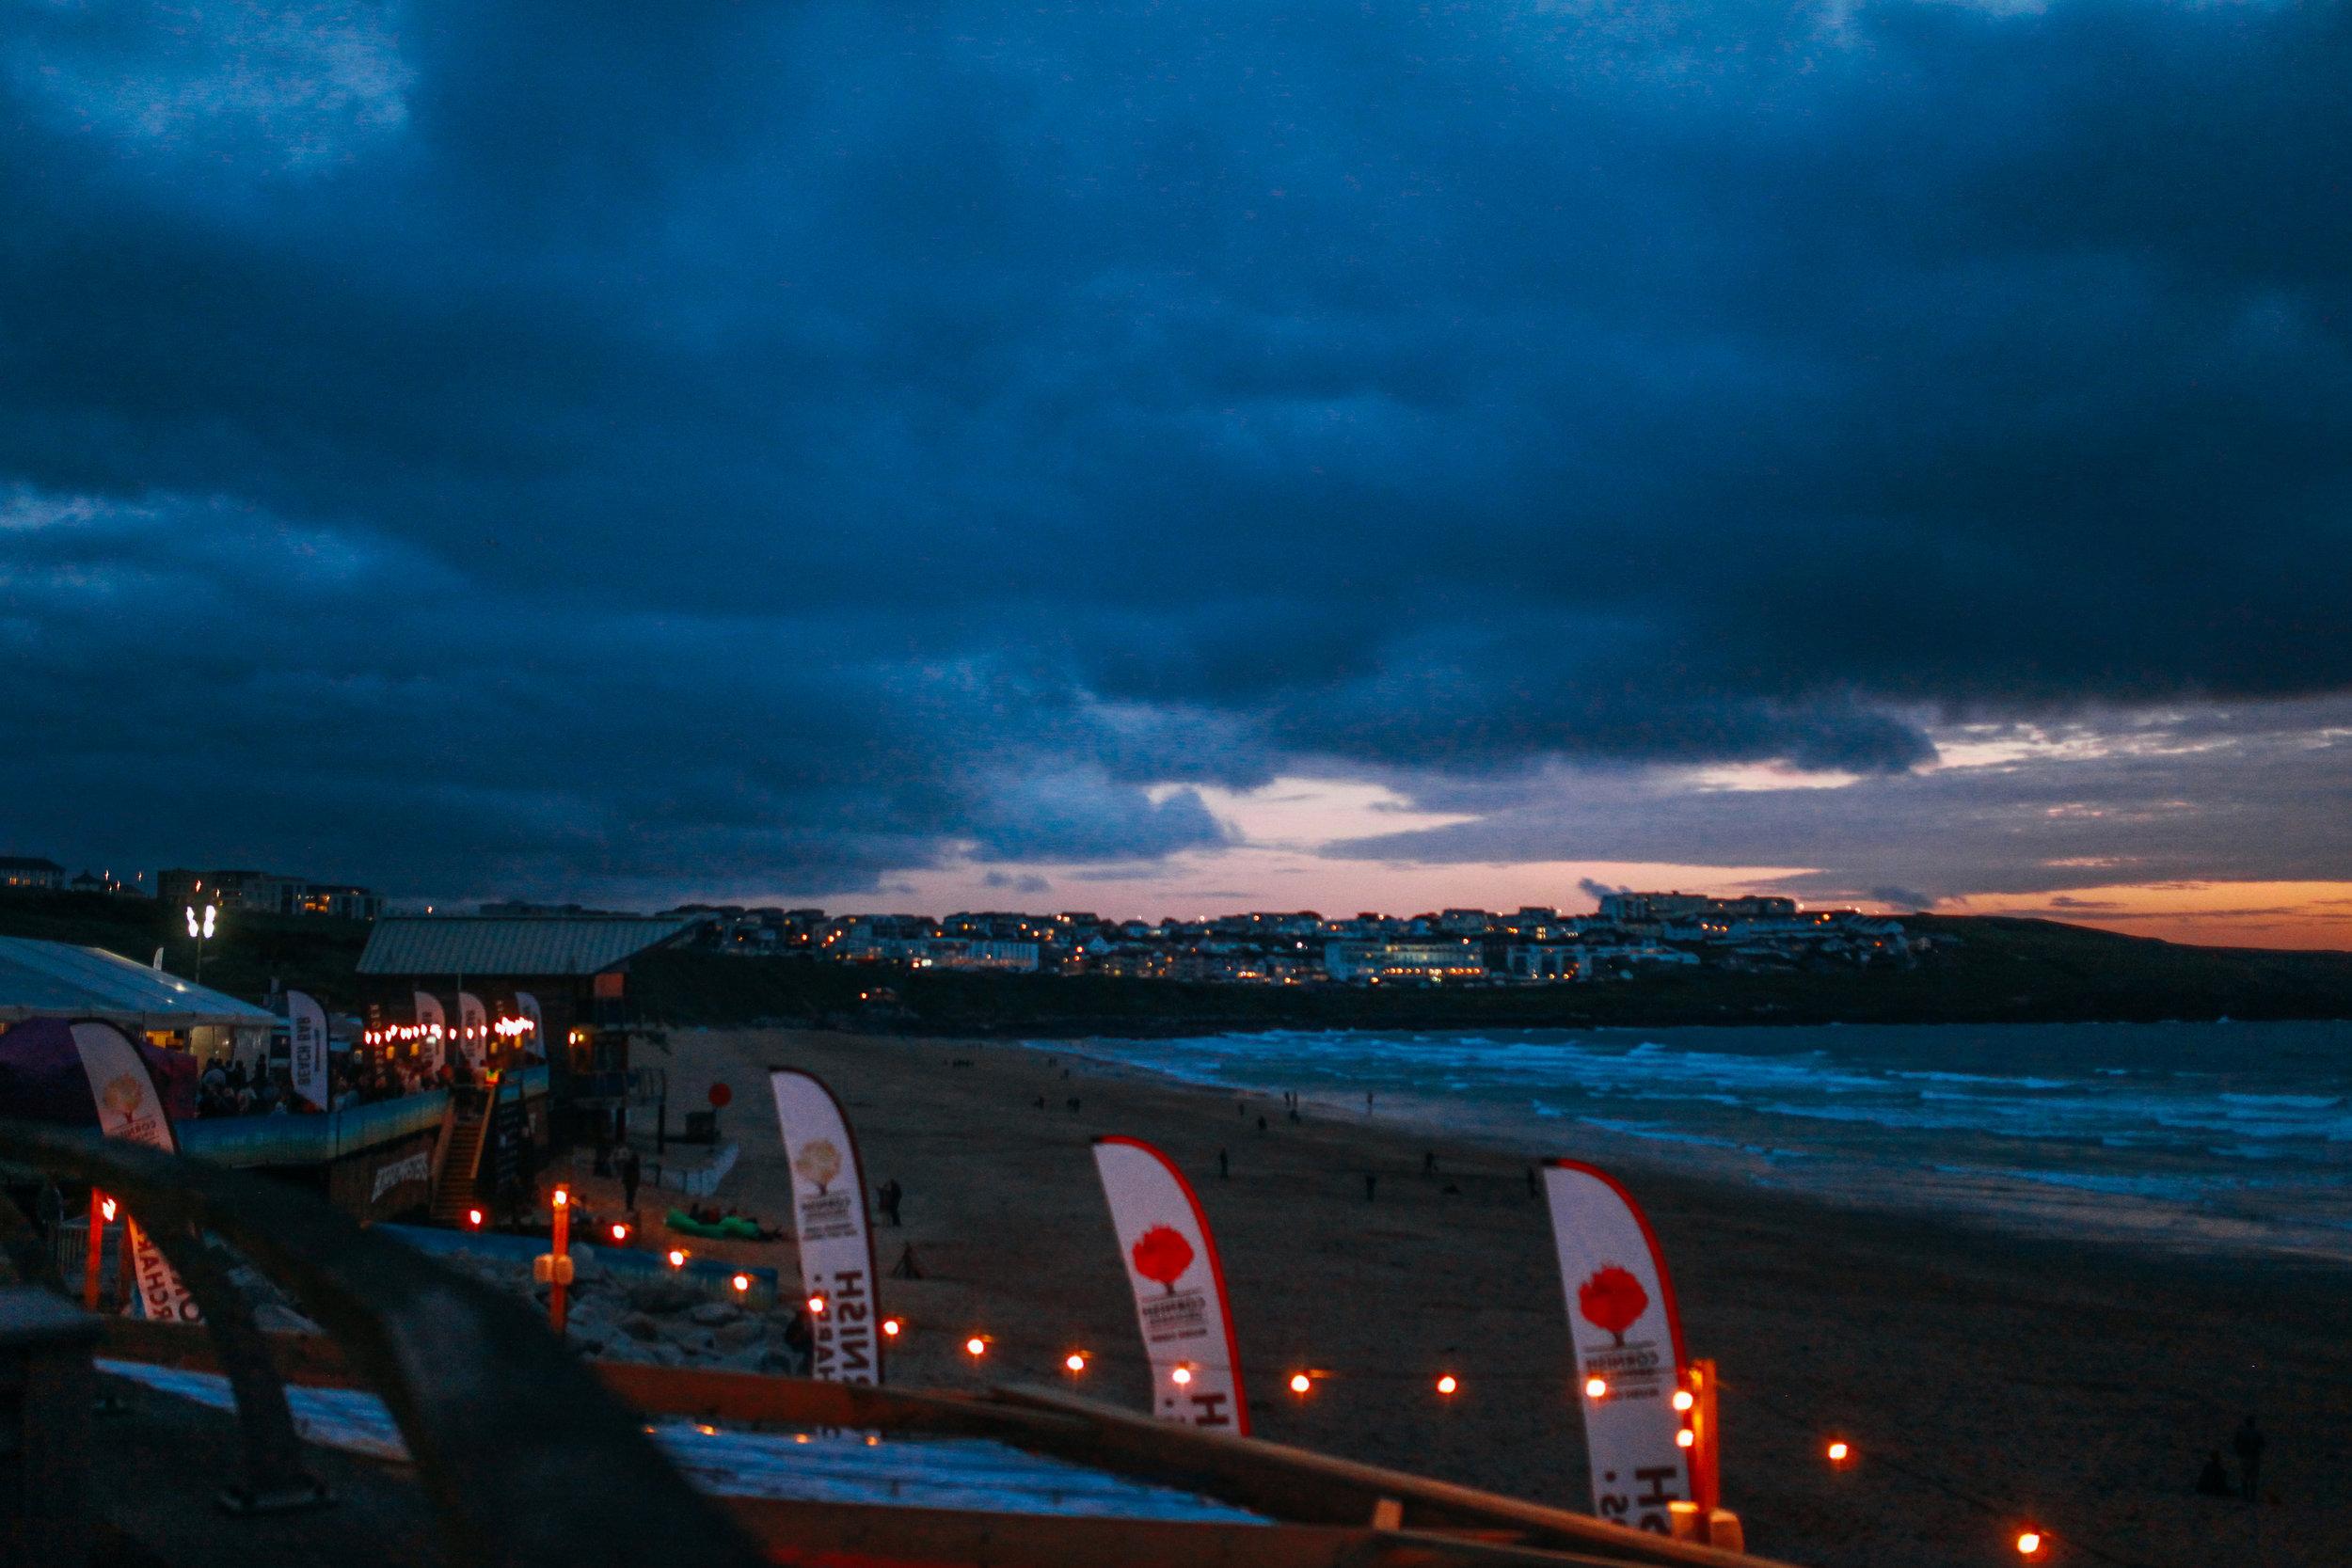 Darina-Stoda-Fistral-Beach-Eve-13.jpg